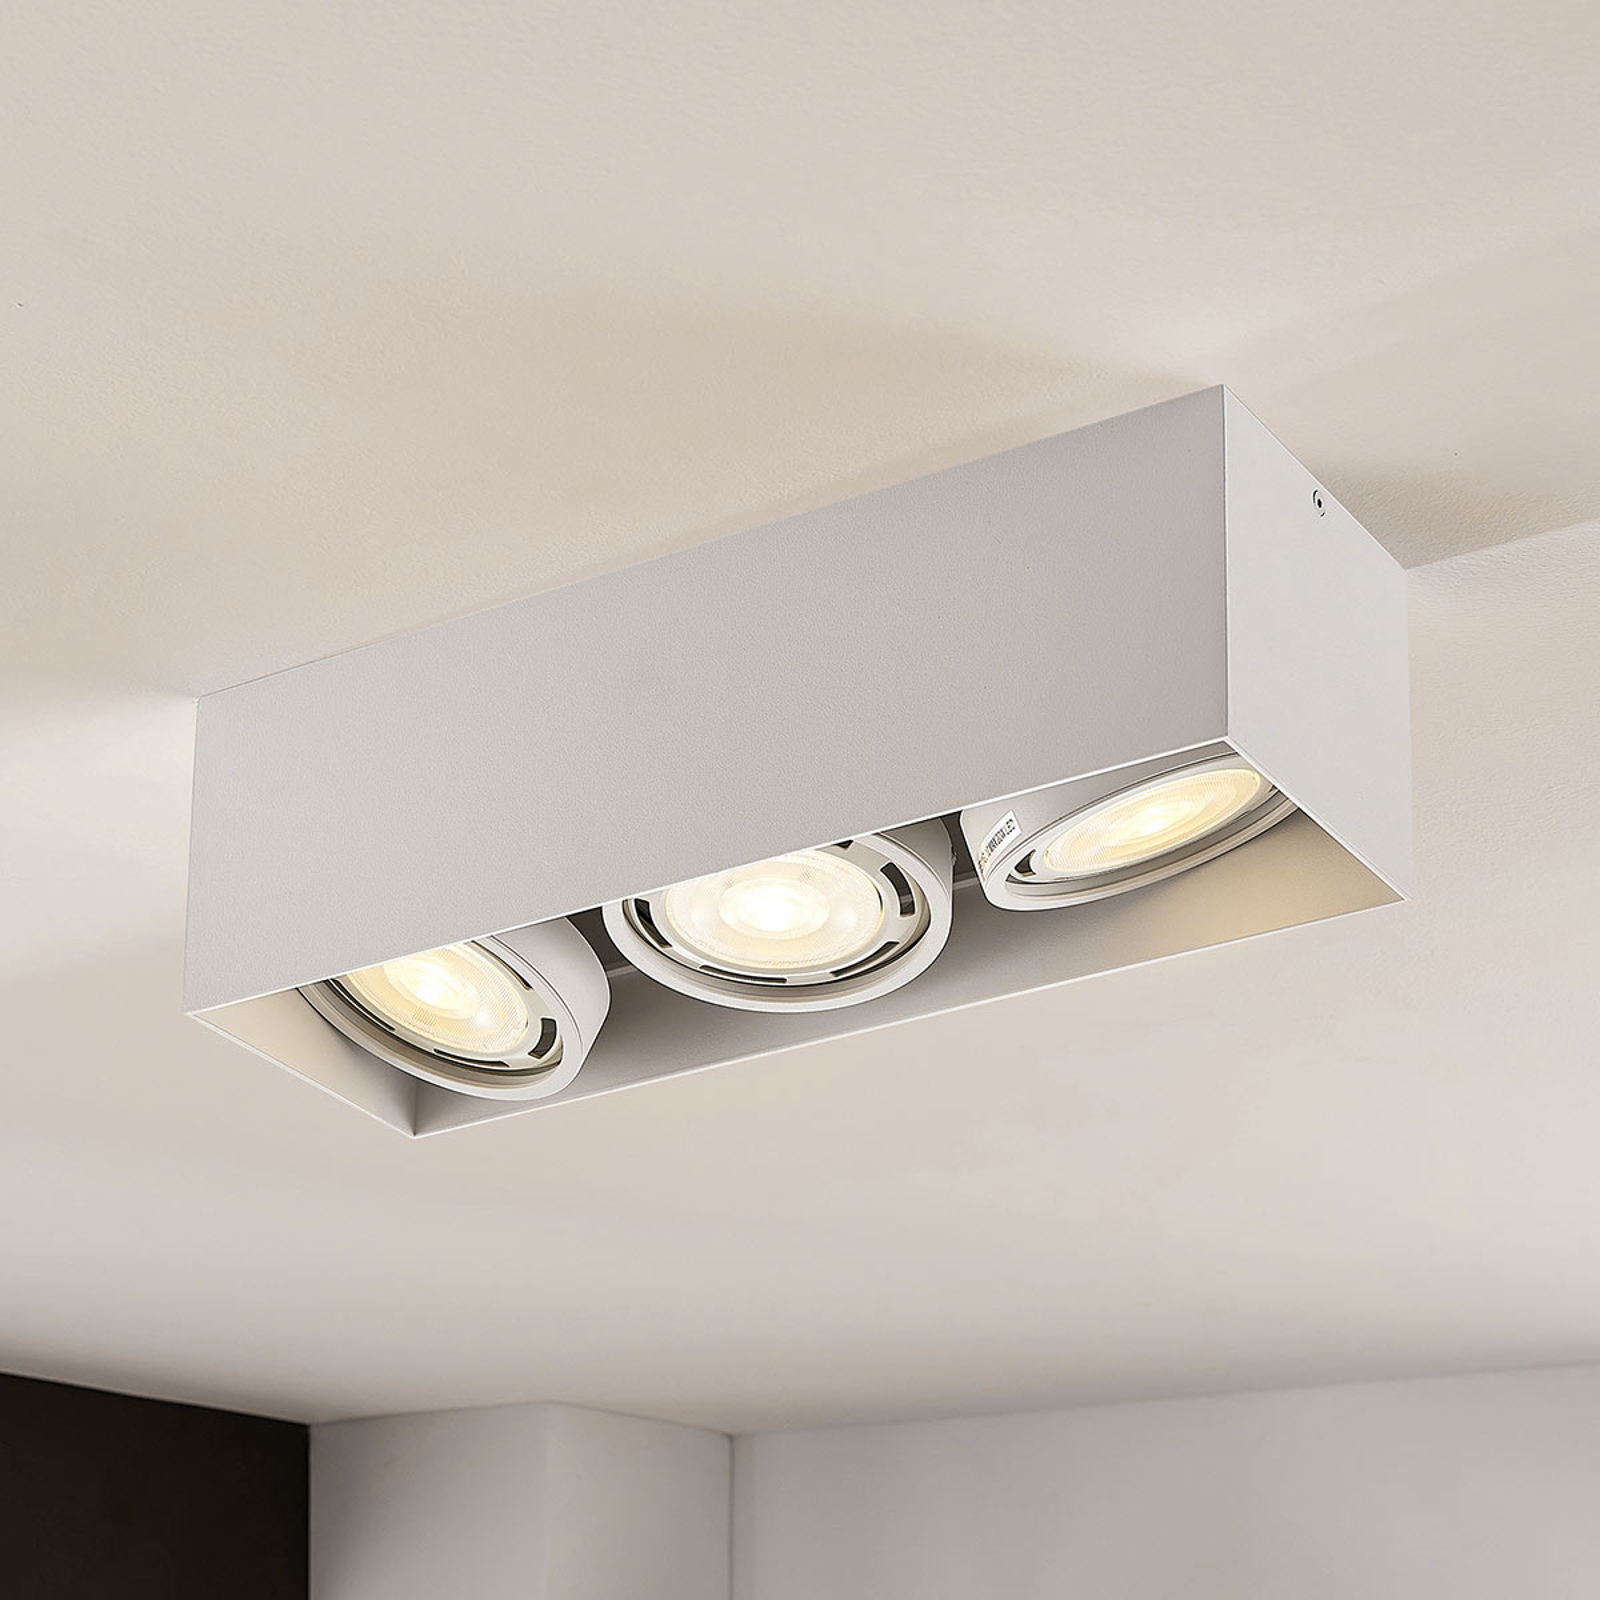 Downlight LED Rosalie à 3 lampes, angulaire, blanc